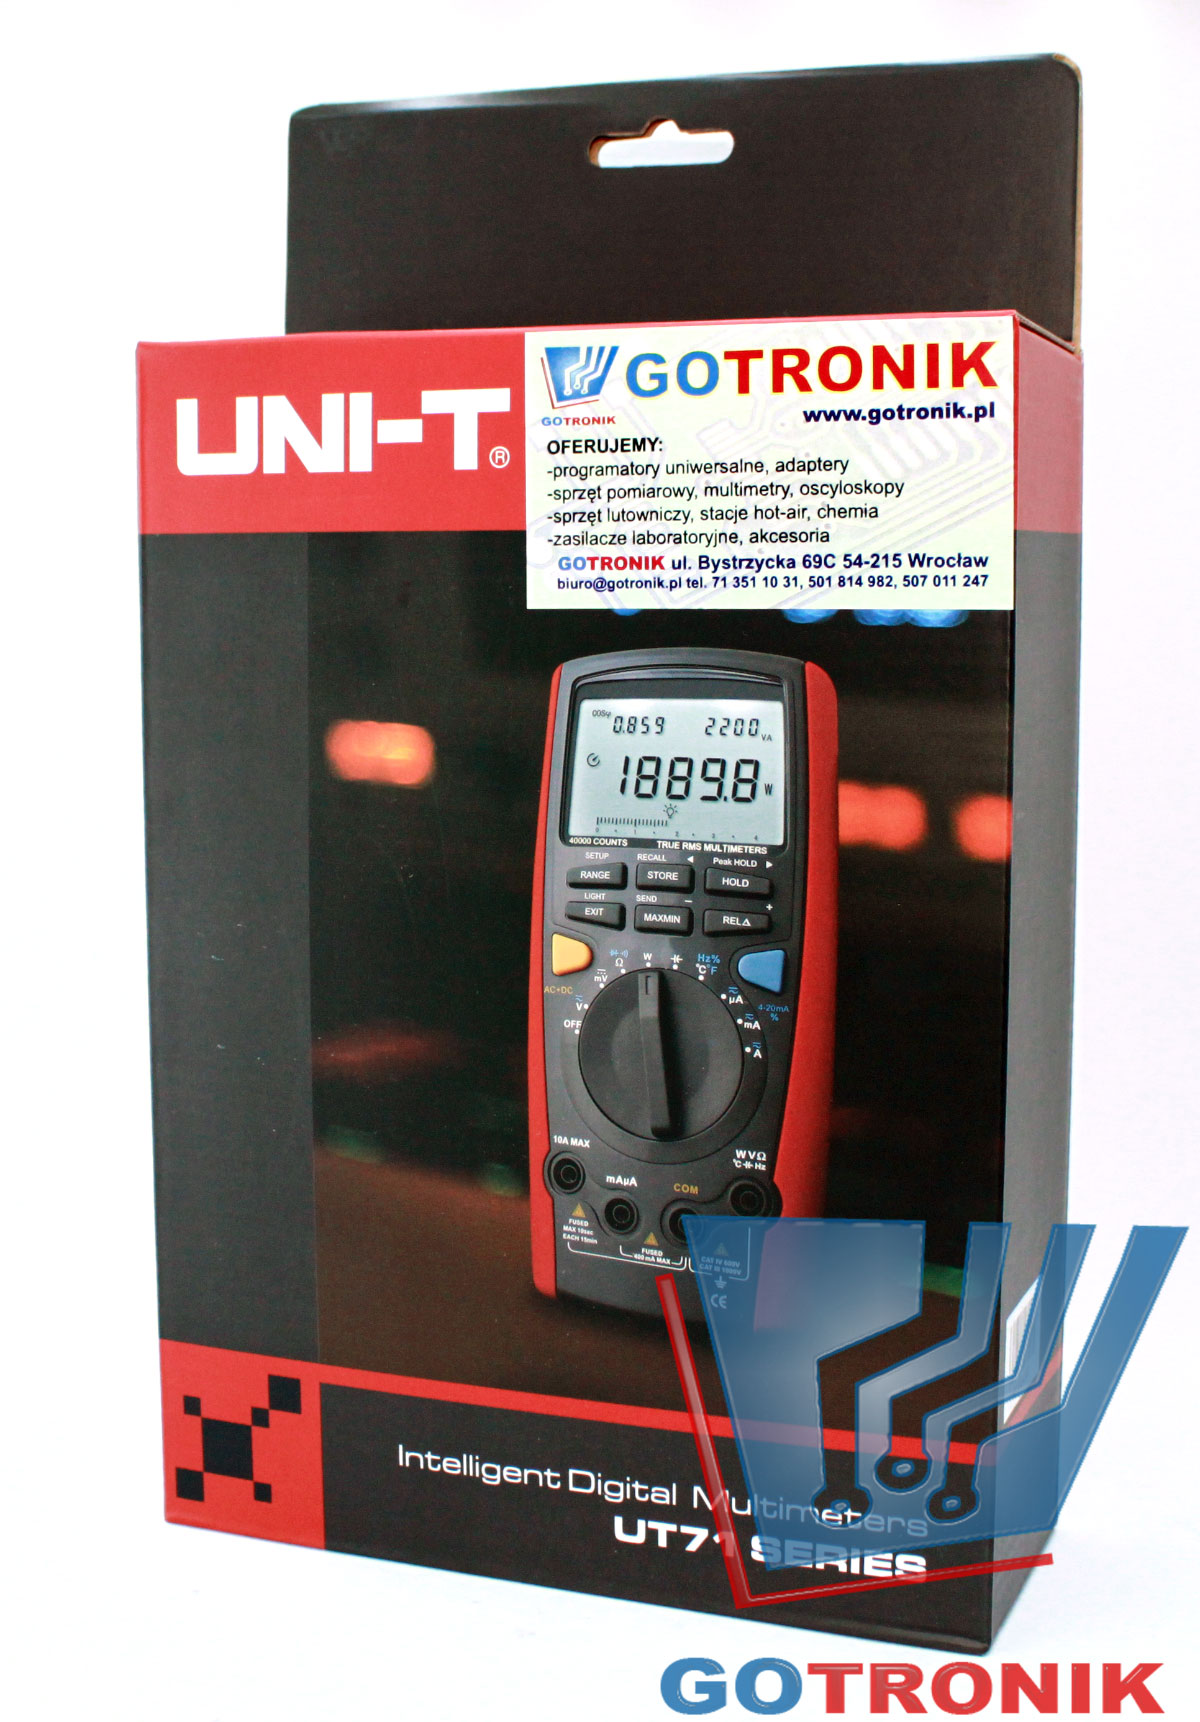 Miernik uniwersalny UT132c multimetr uniwersalny UT71b produkcji Uni-trend